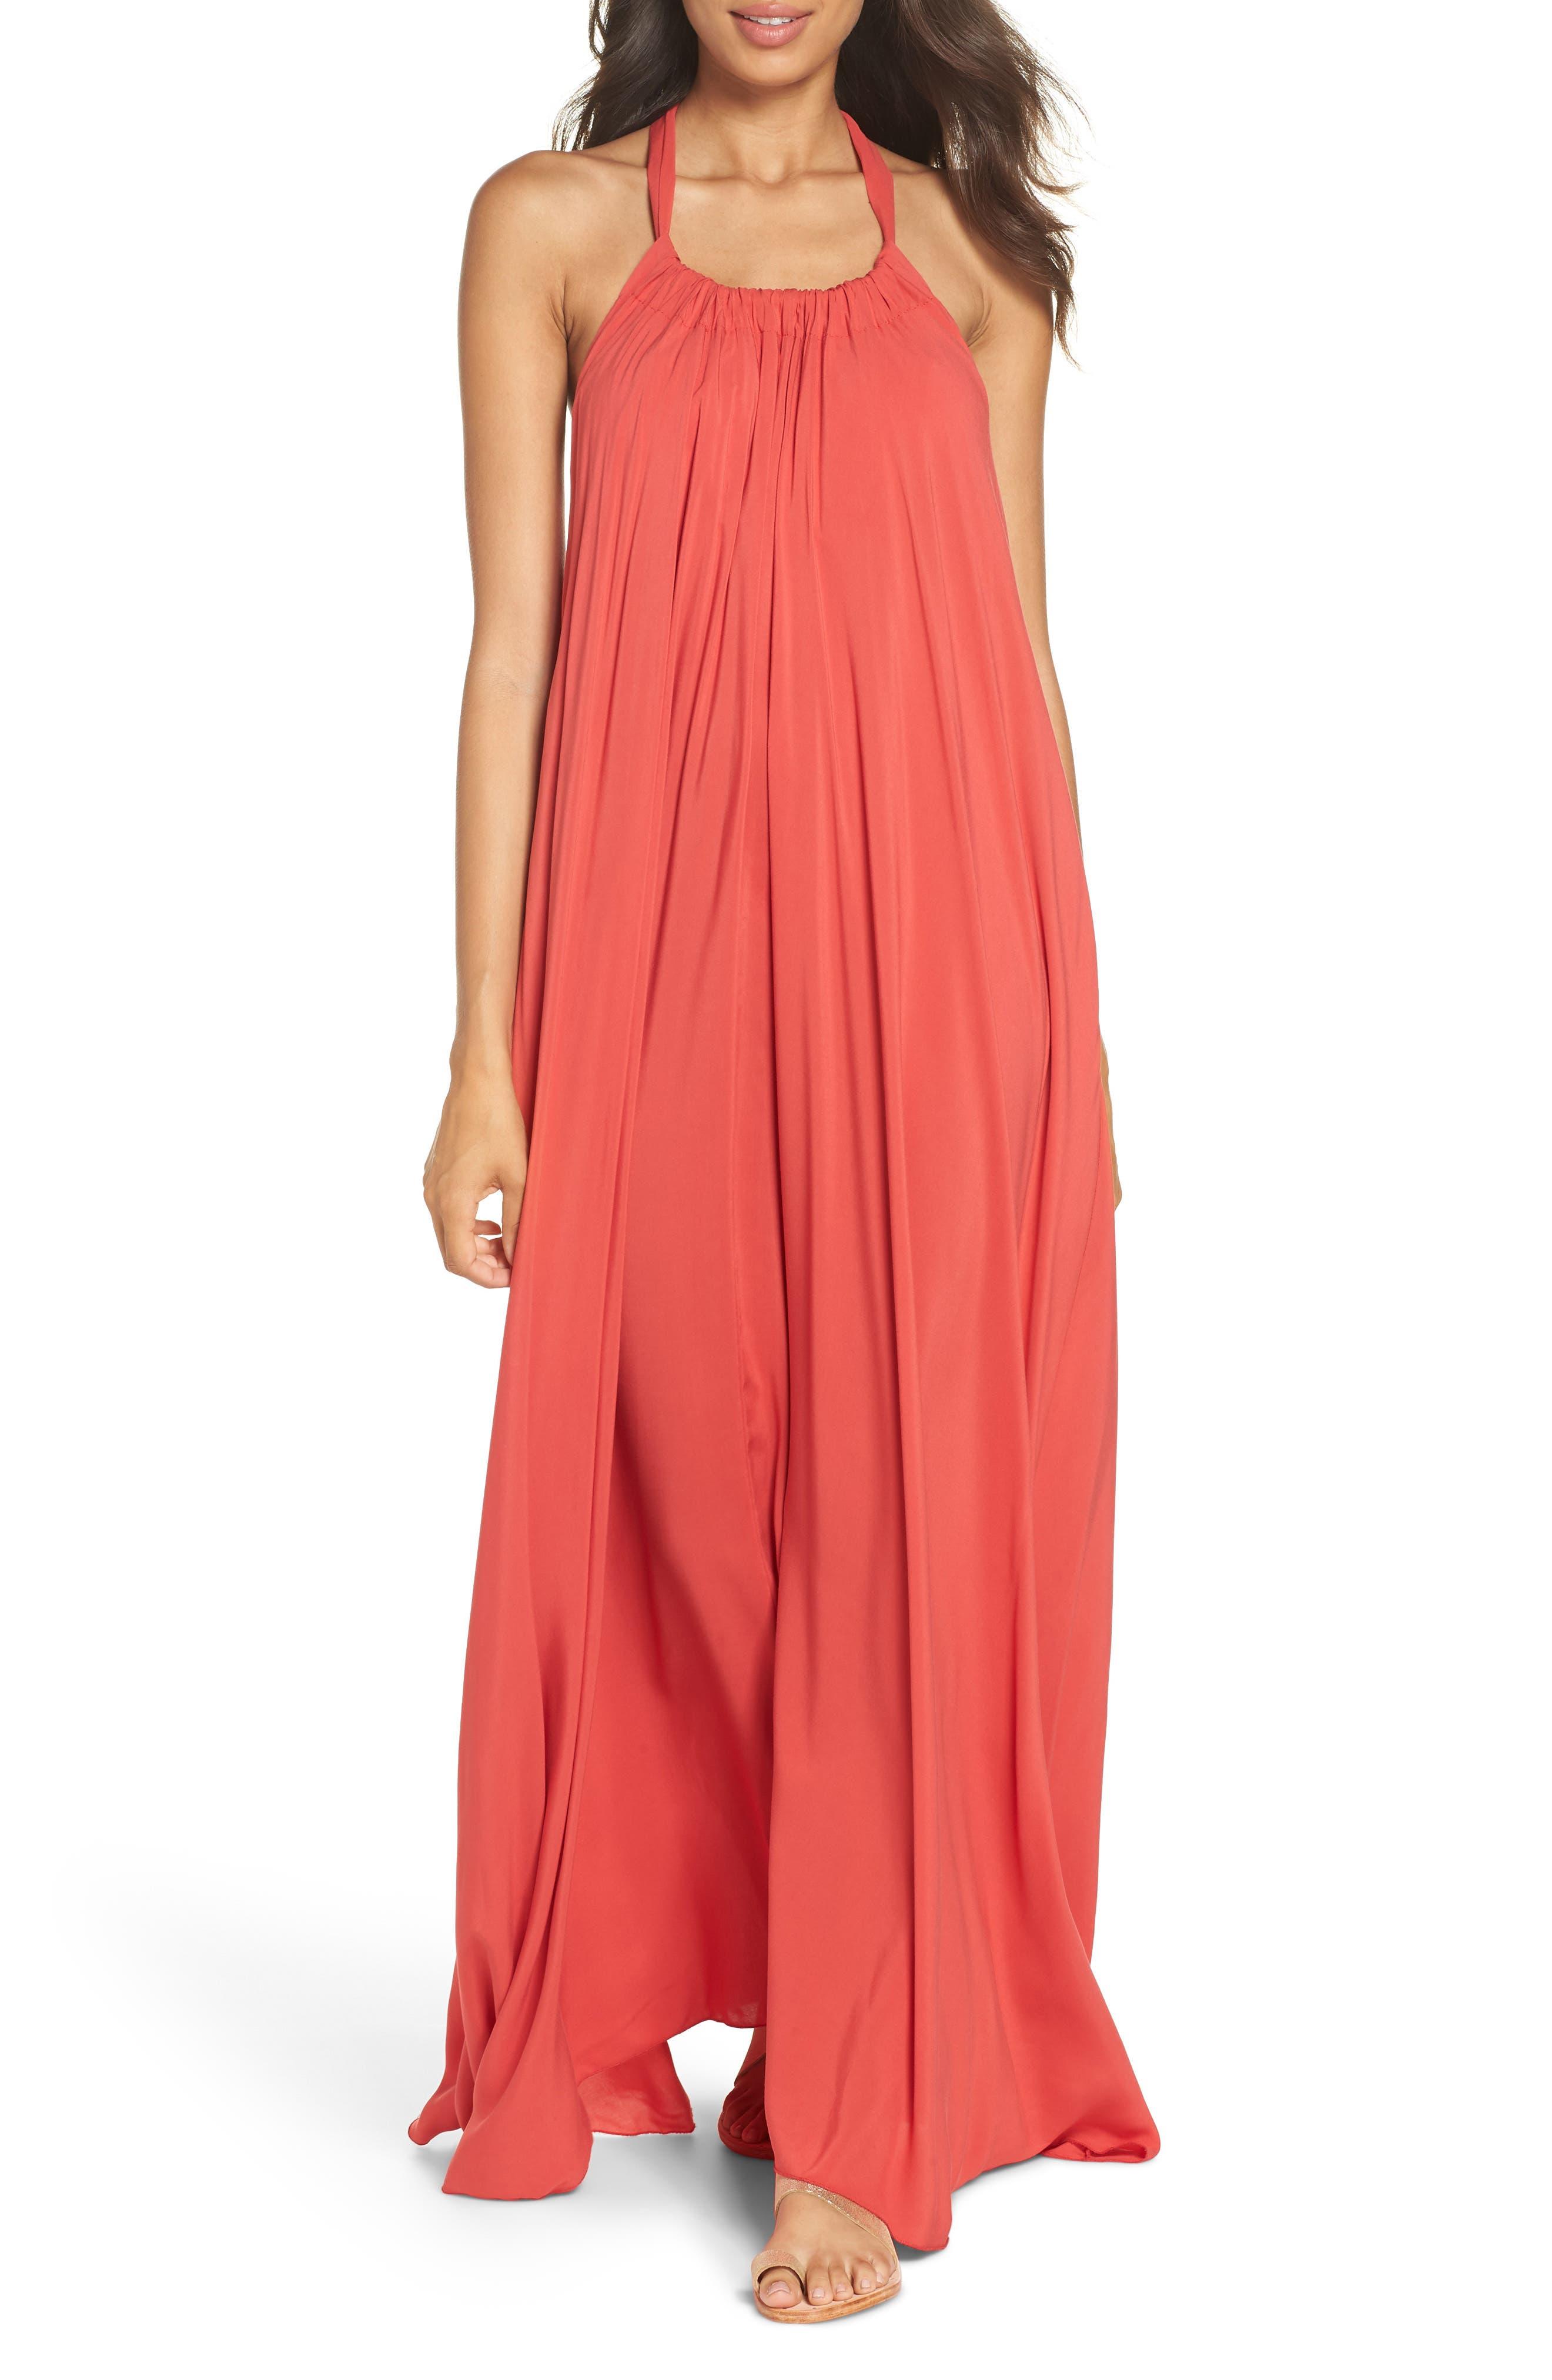 Elan Cover-Up Maxi Dress, Coral